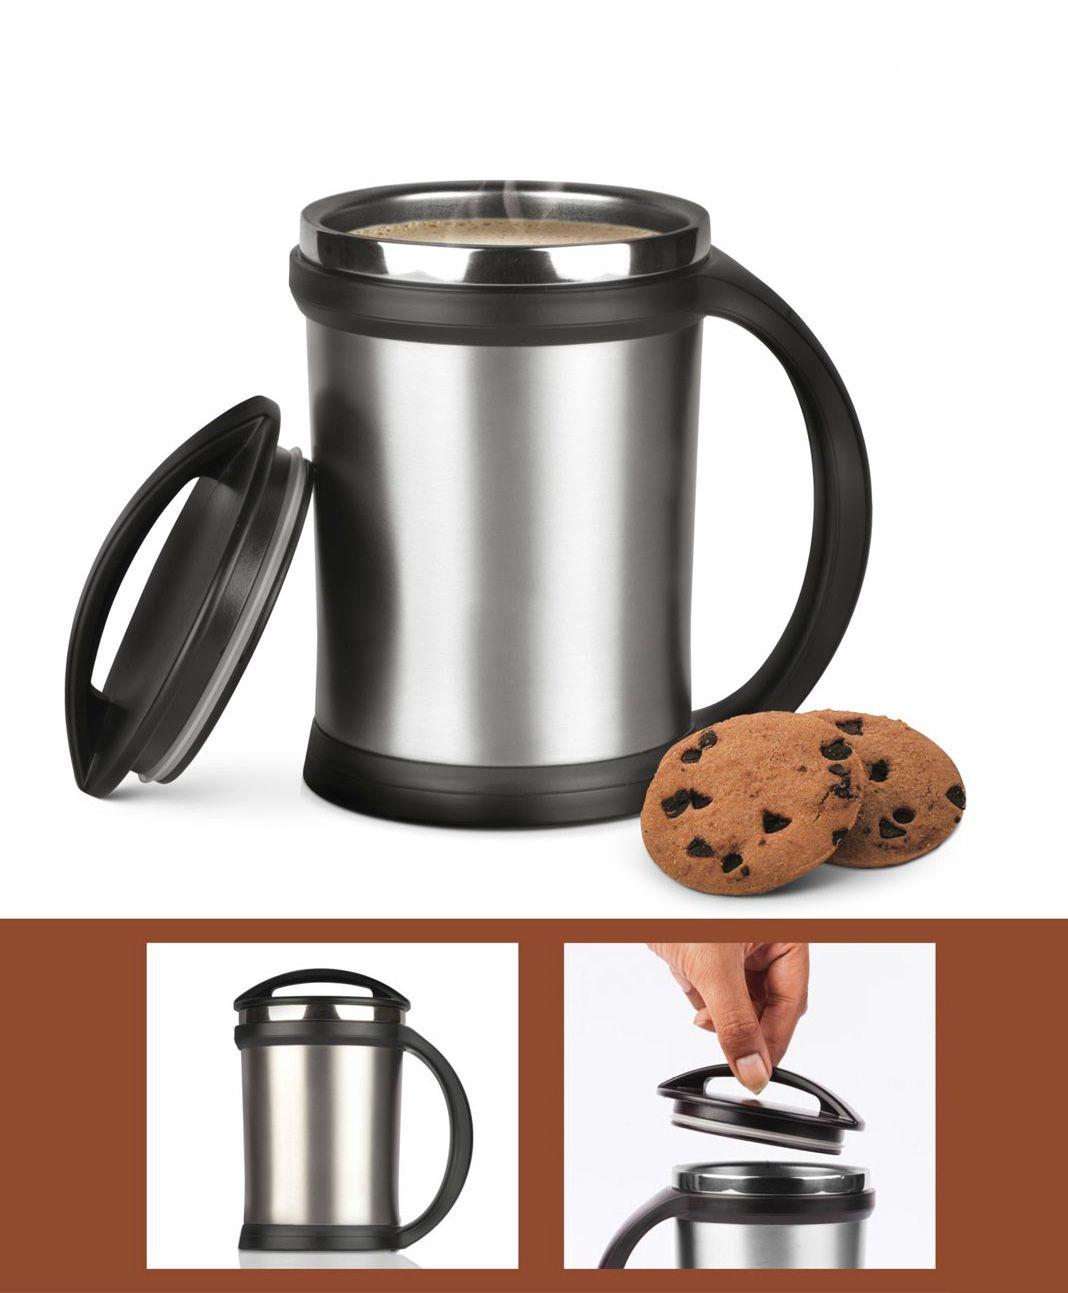 Power Plus Power Plus Vacuumized Travel Mug H36 Silver